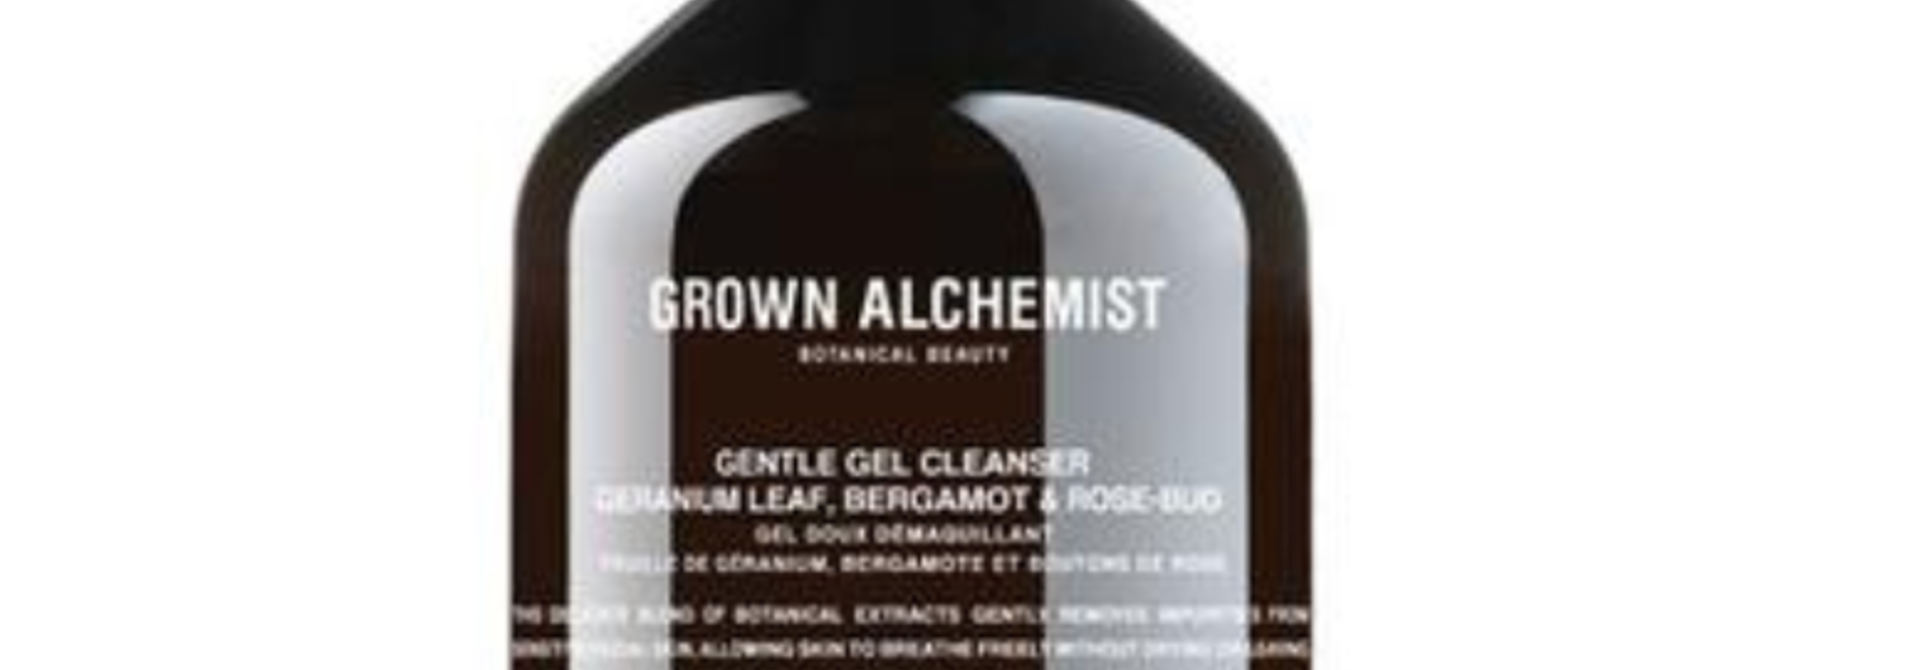 Gentle gel facial cleanser: Geranium leaf, Bergamot & Rose-Bud 200 ml